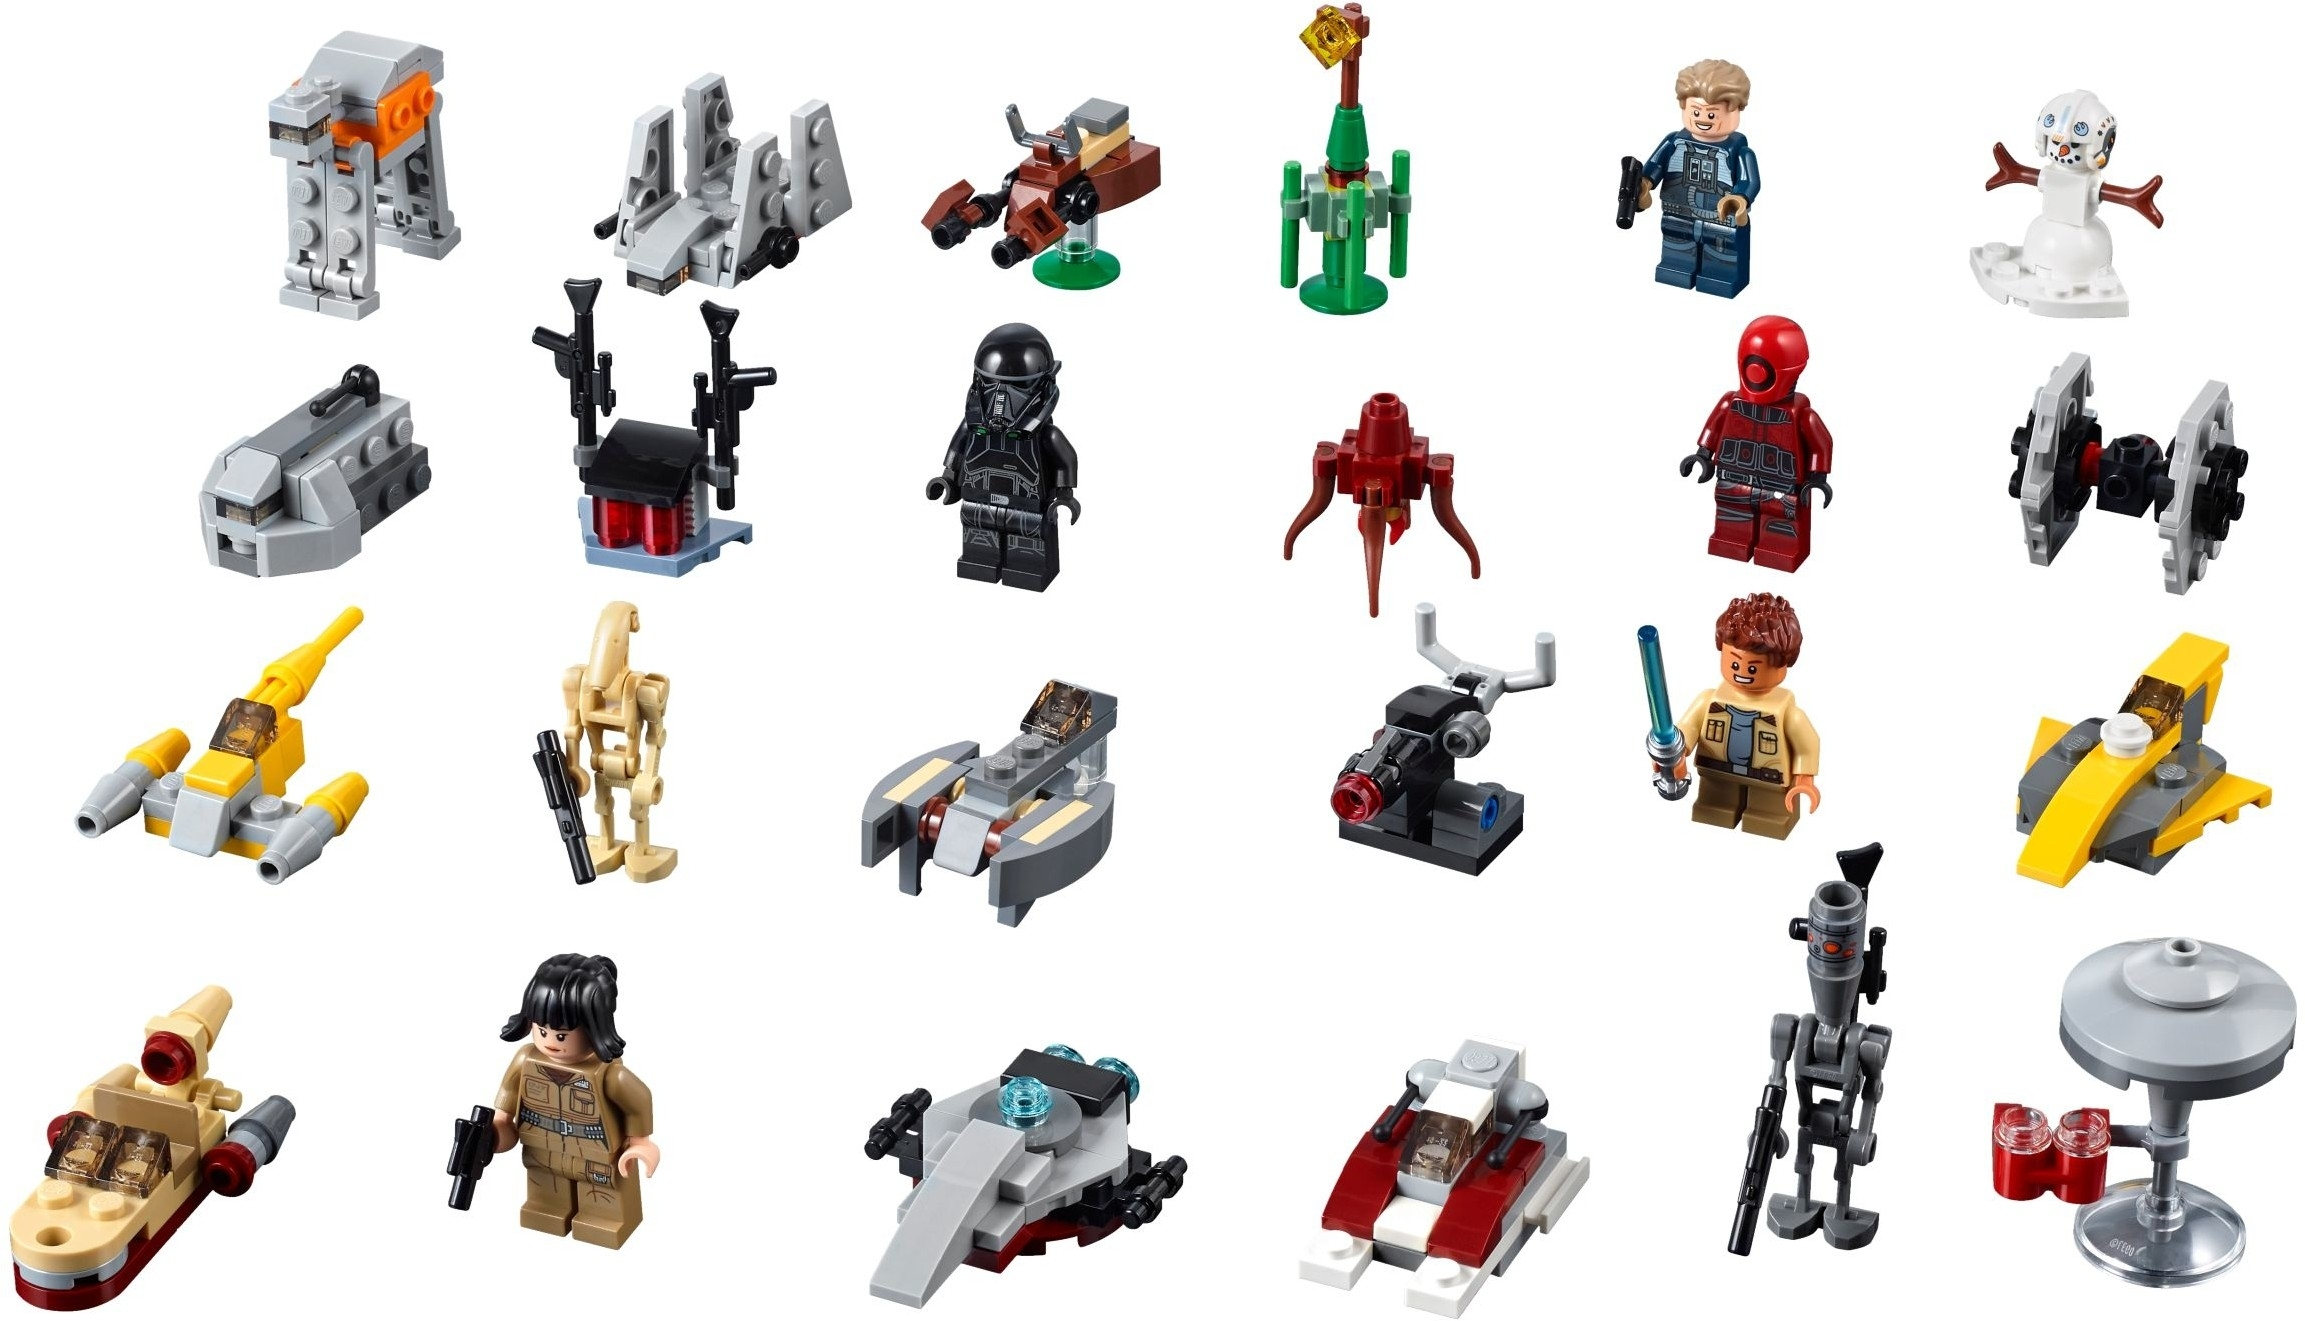 Lego 75213 Star Wars Advent Calendar Instructions, Star Wars with Are There Instructions For The Lego Star Wars Advent Calendar